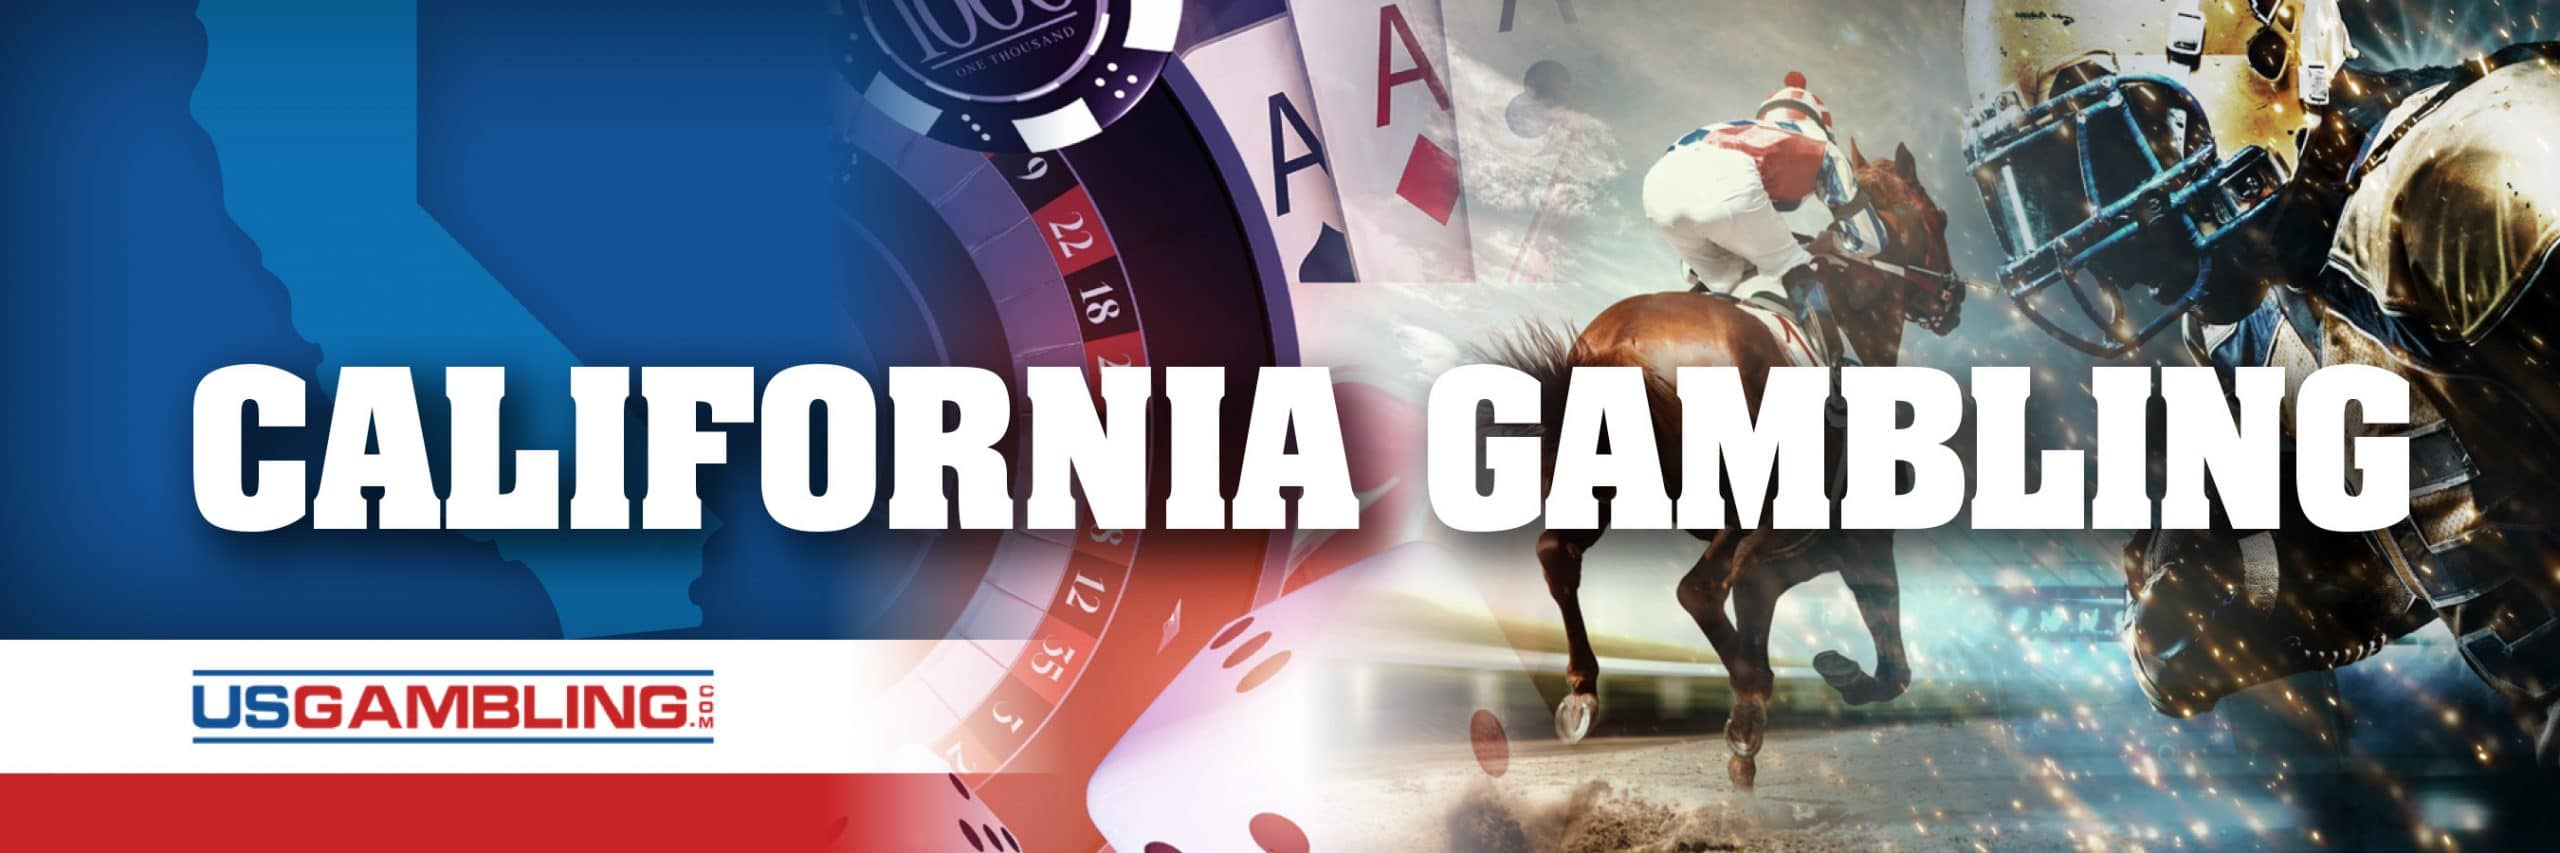 Legal California Gambling